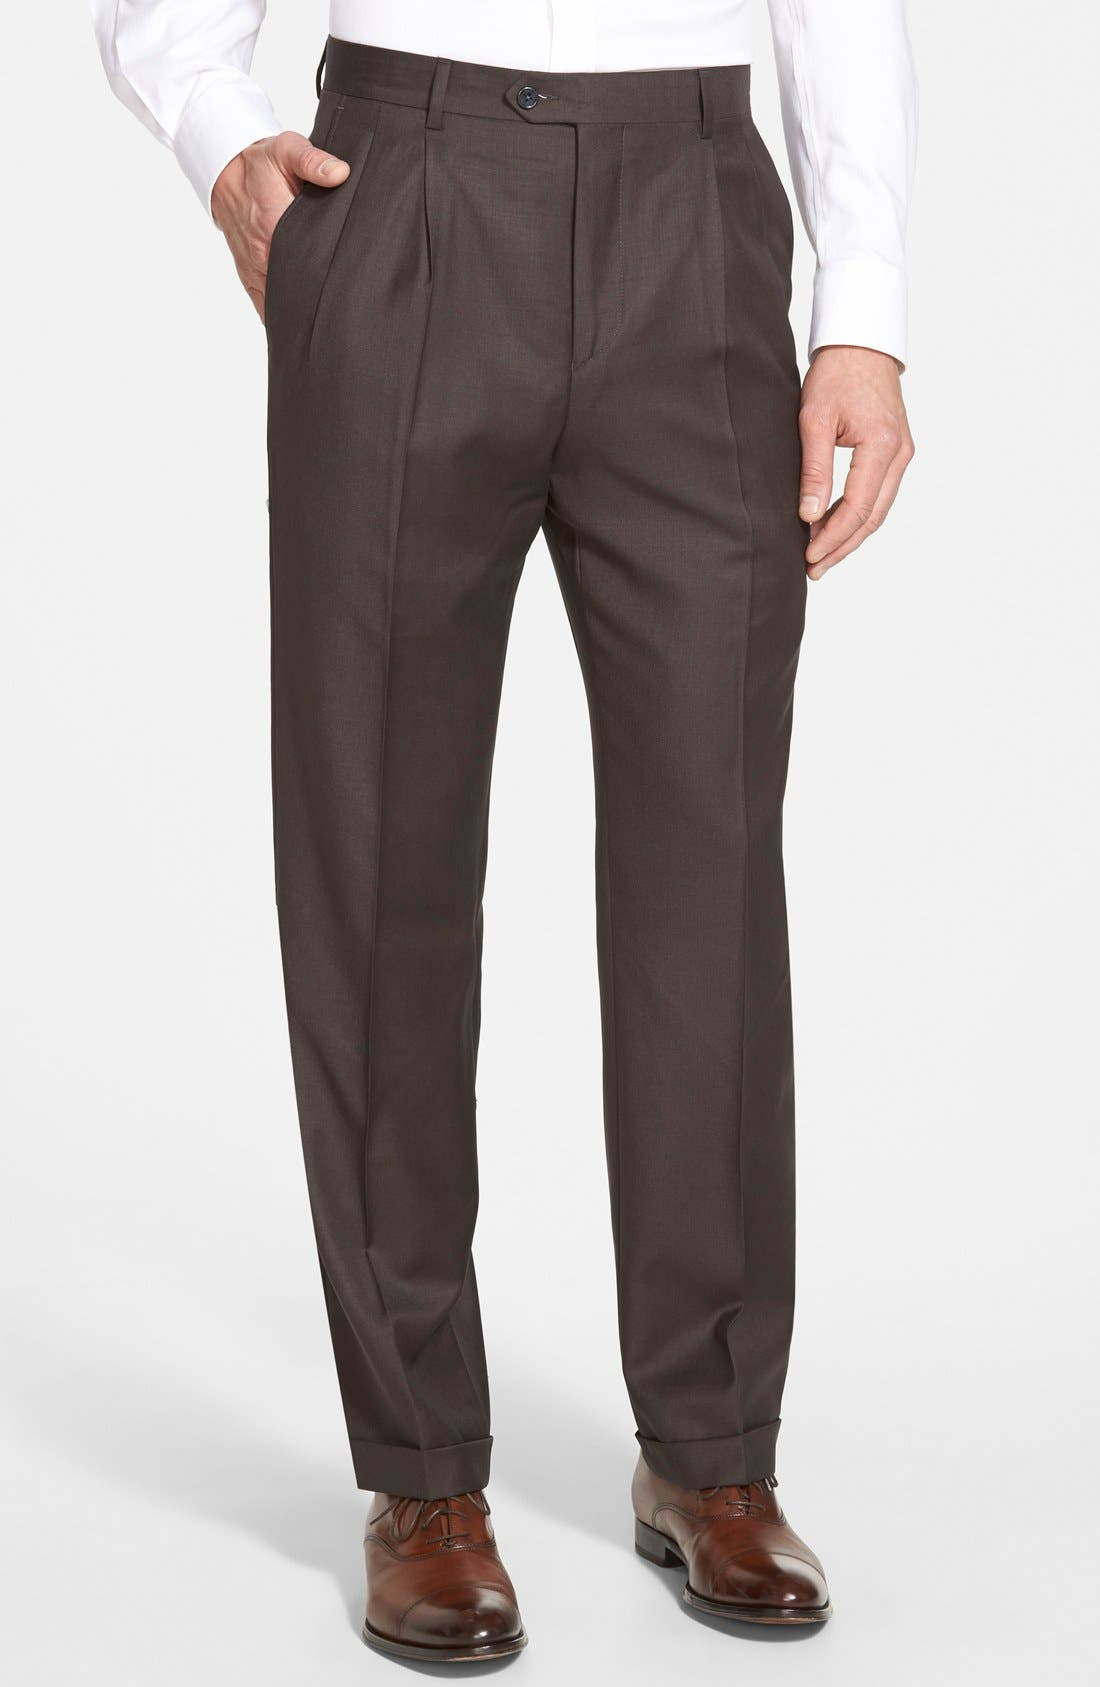 Main Image - Santorelli 'Luxury Serge' Double Pleated Wool Trousers